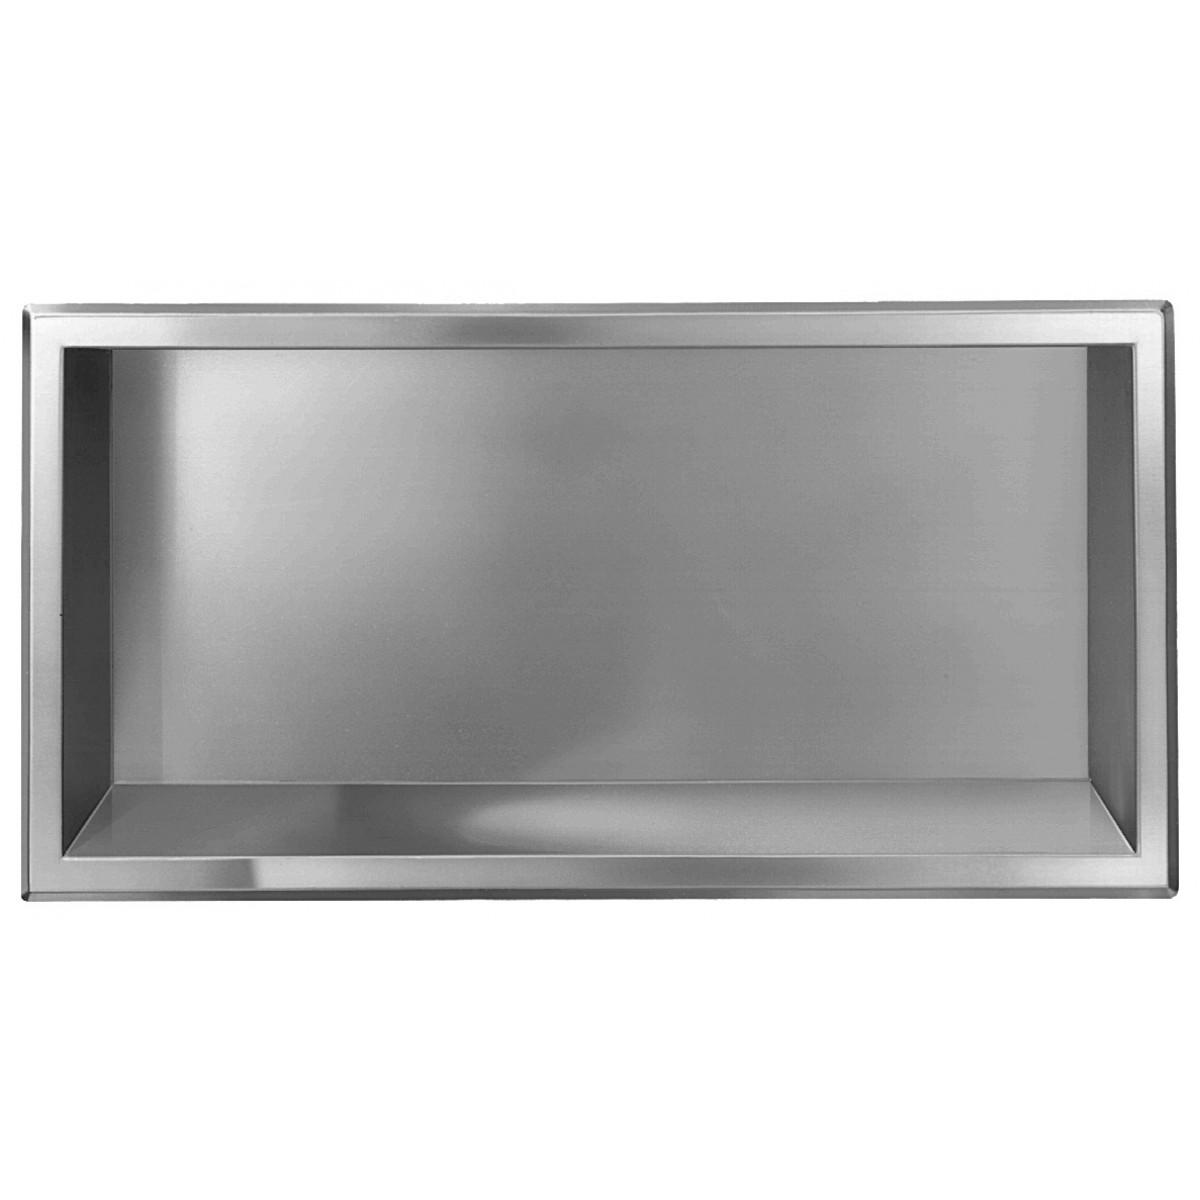 Bradley 760 Recessed Stainless Steel Shelf